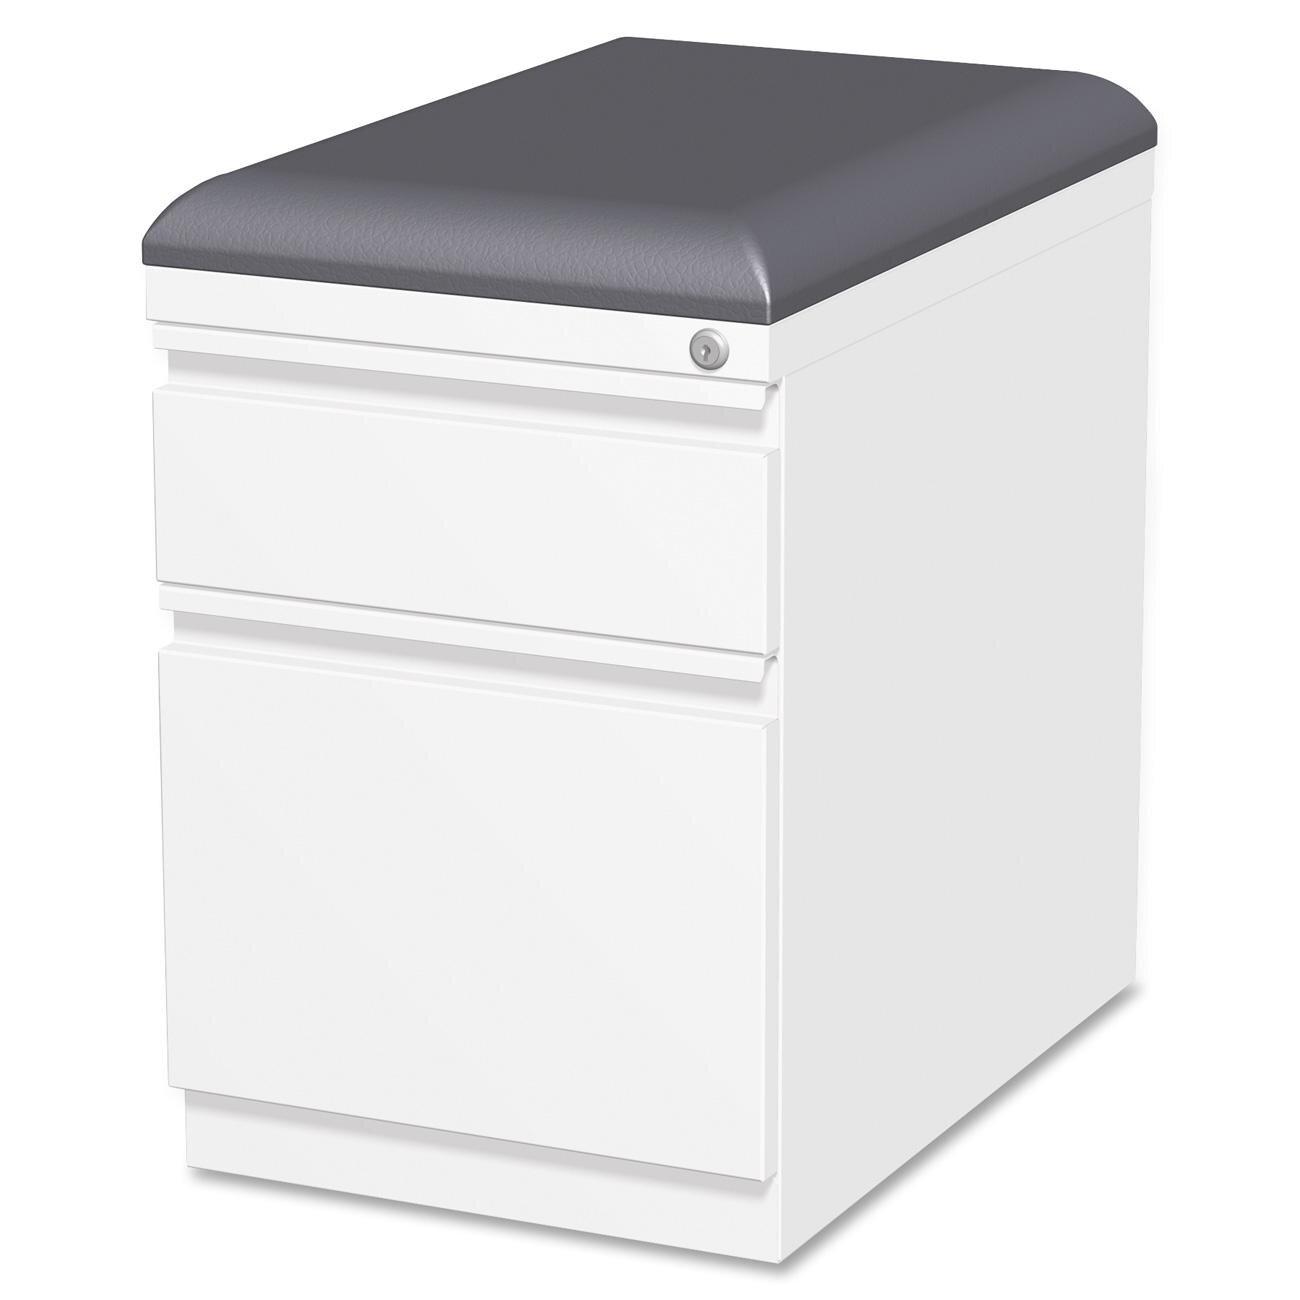 Lorell Lateral File Cabinet Lorell Cushion Seat Storage Mobile Pedestal File Reviews Wayfair